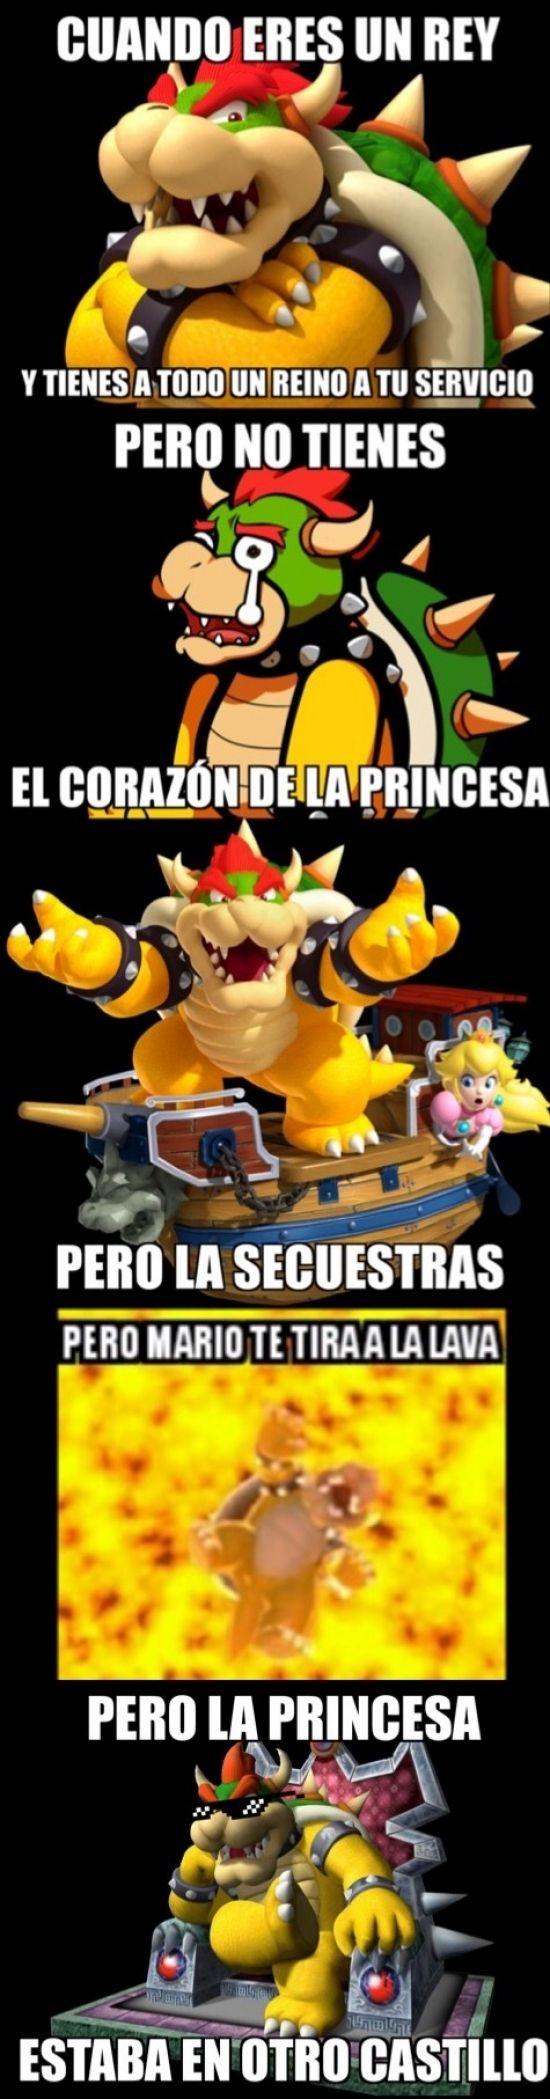 ★★★★★ Memes divertidos chilenos: El dilema de Bowser I➨ http://www.diverint.com/memes-divertidos-chilenos-dilema-bowser/ →  #losmemesmásdivertidosenespañol #memegeneratorenespañolgraciosos #memesderisaburlona #memesderisaparafacebook #memesgraciososespañol